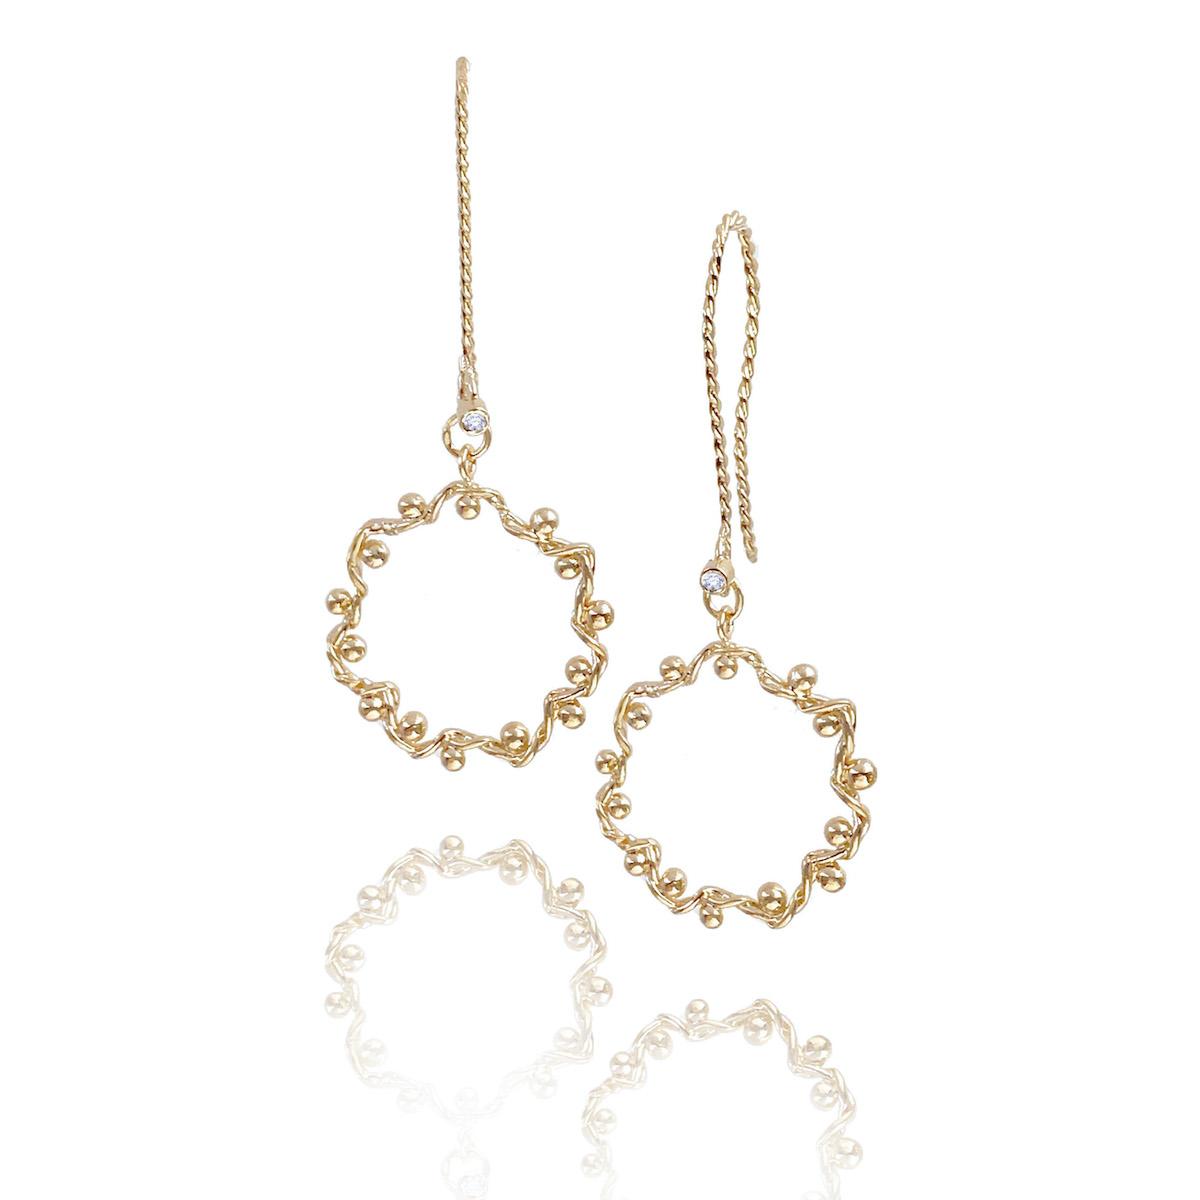 twist-wave-dangle-hoop-earrings-textured French-hook-14k-18k-jewelyrie_6869YG-R